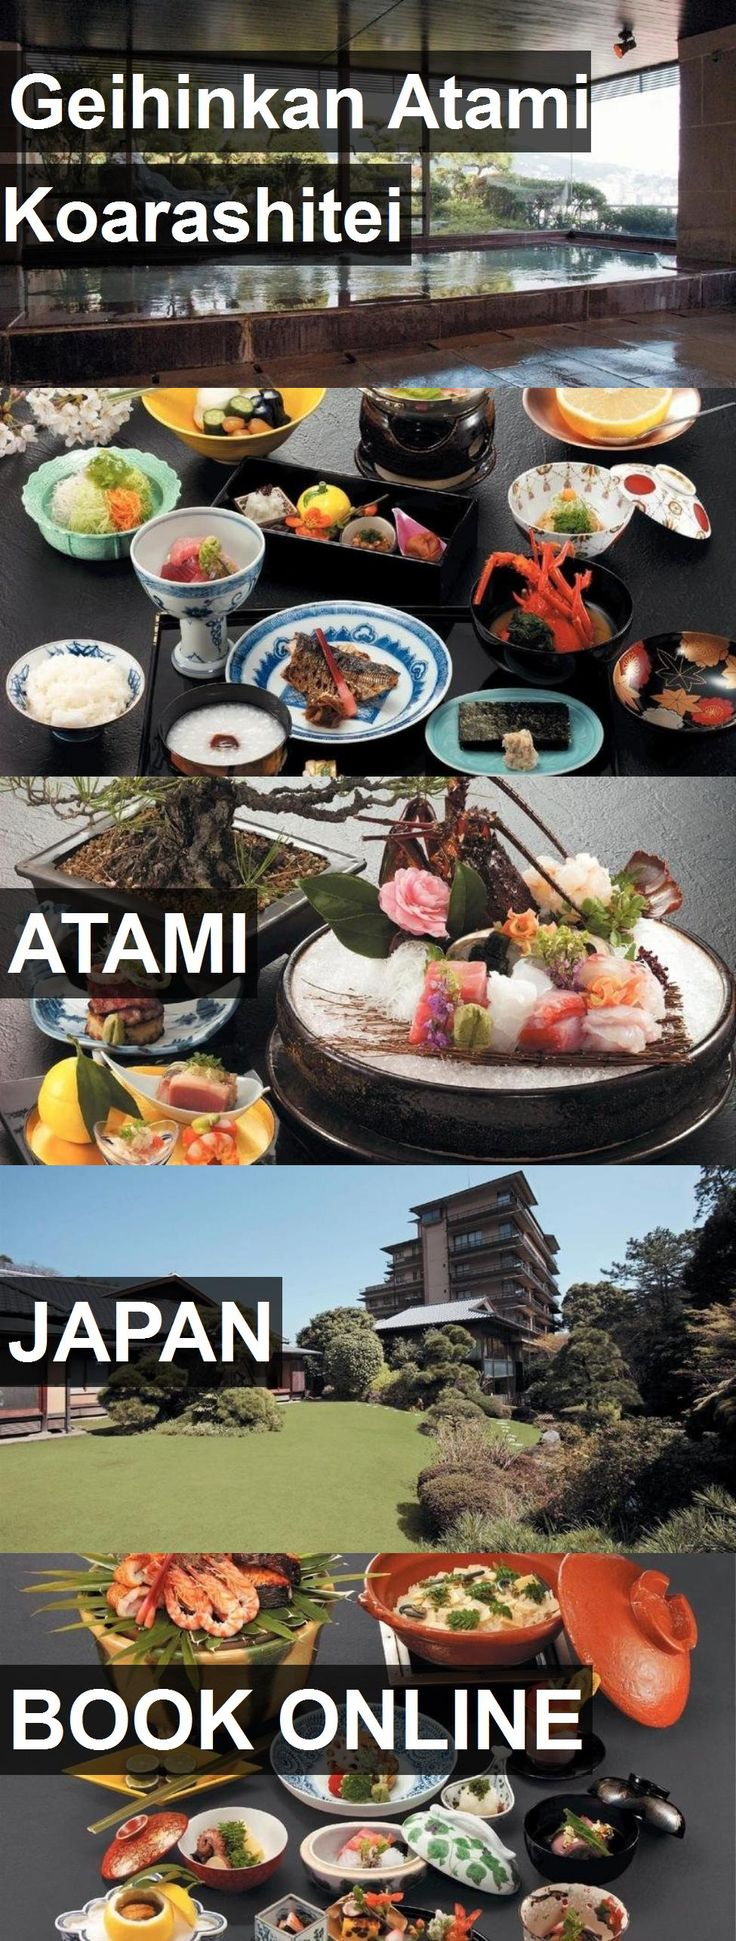 Hotel Geihinkan Atami Koarashitei in Atami, Japan. For more information, photos, reviews and best prices please follow the link. #Japan #Atami #travel #vacation #hotel